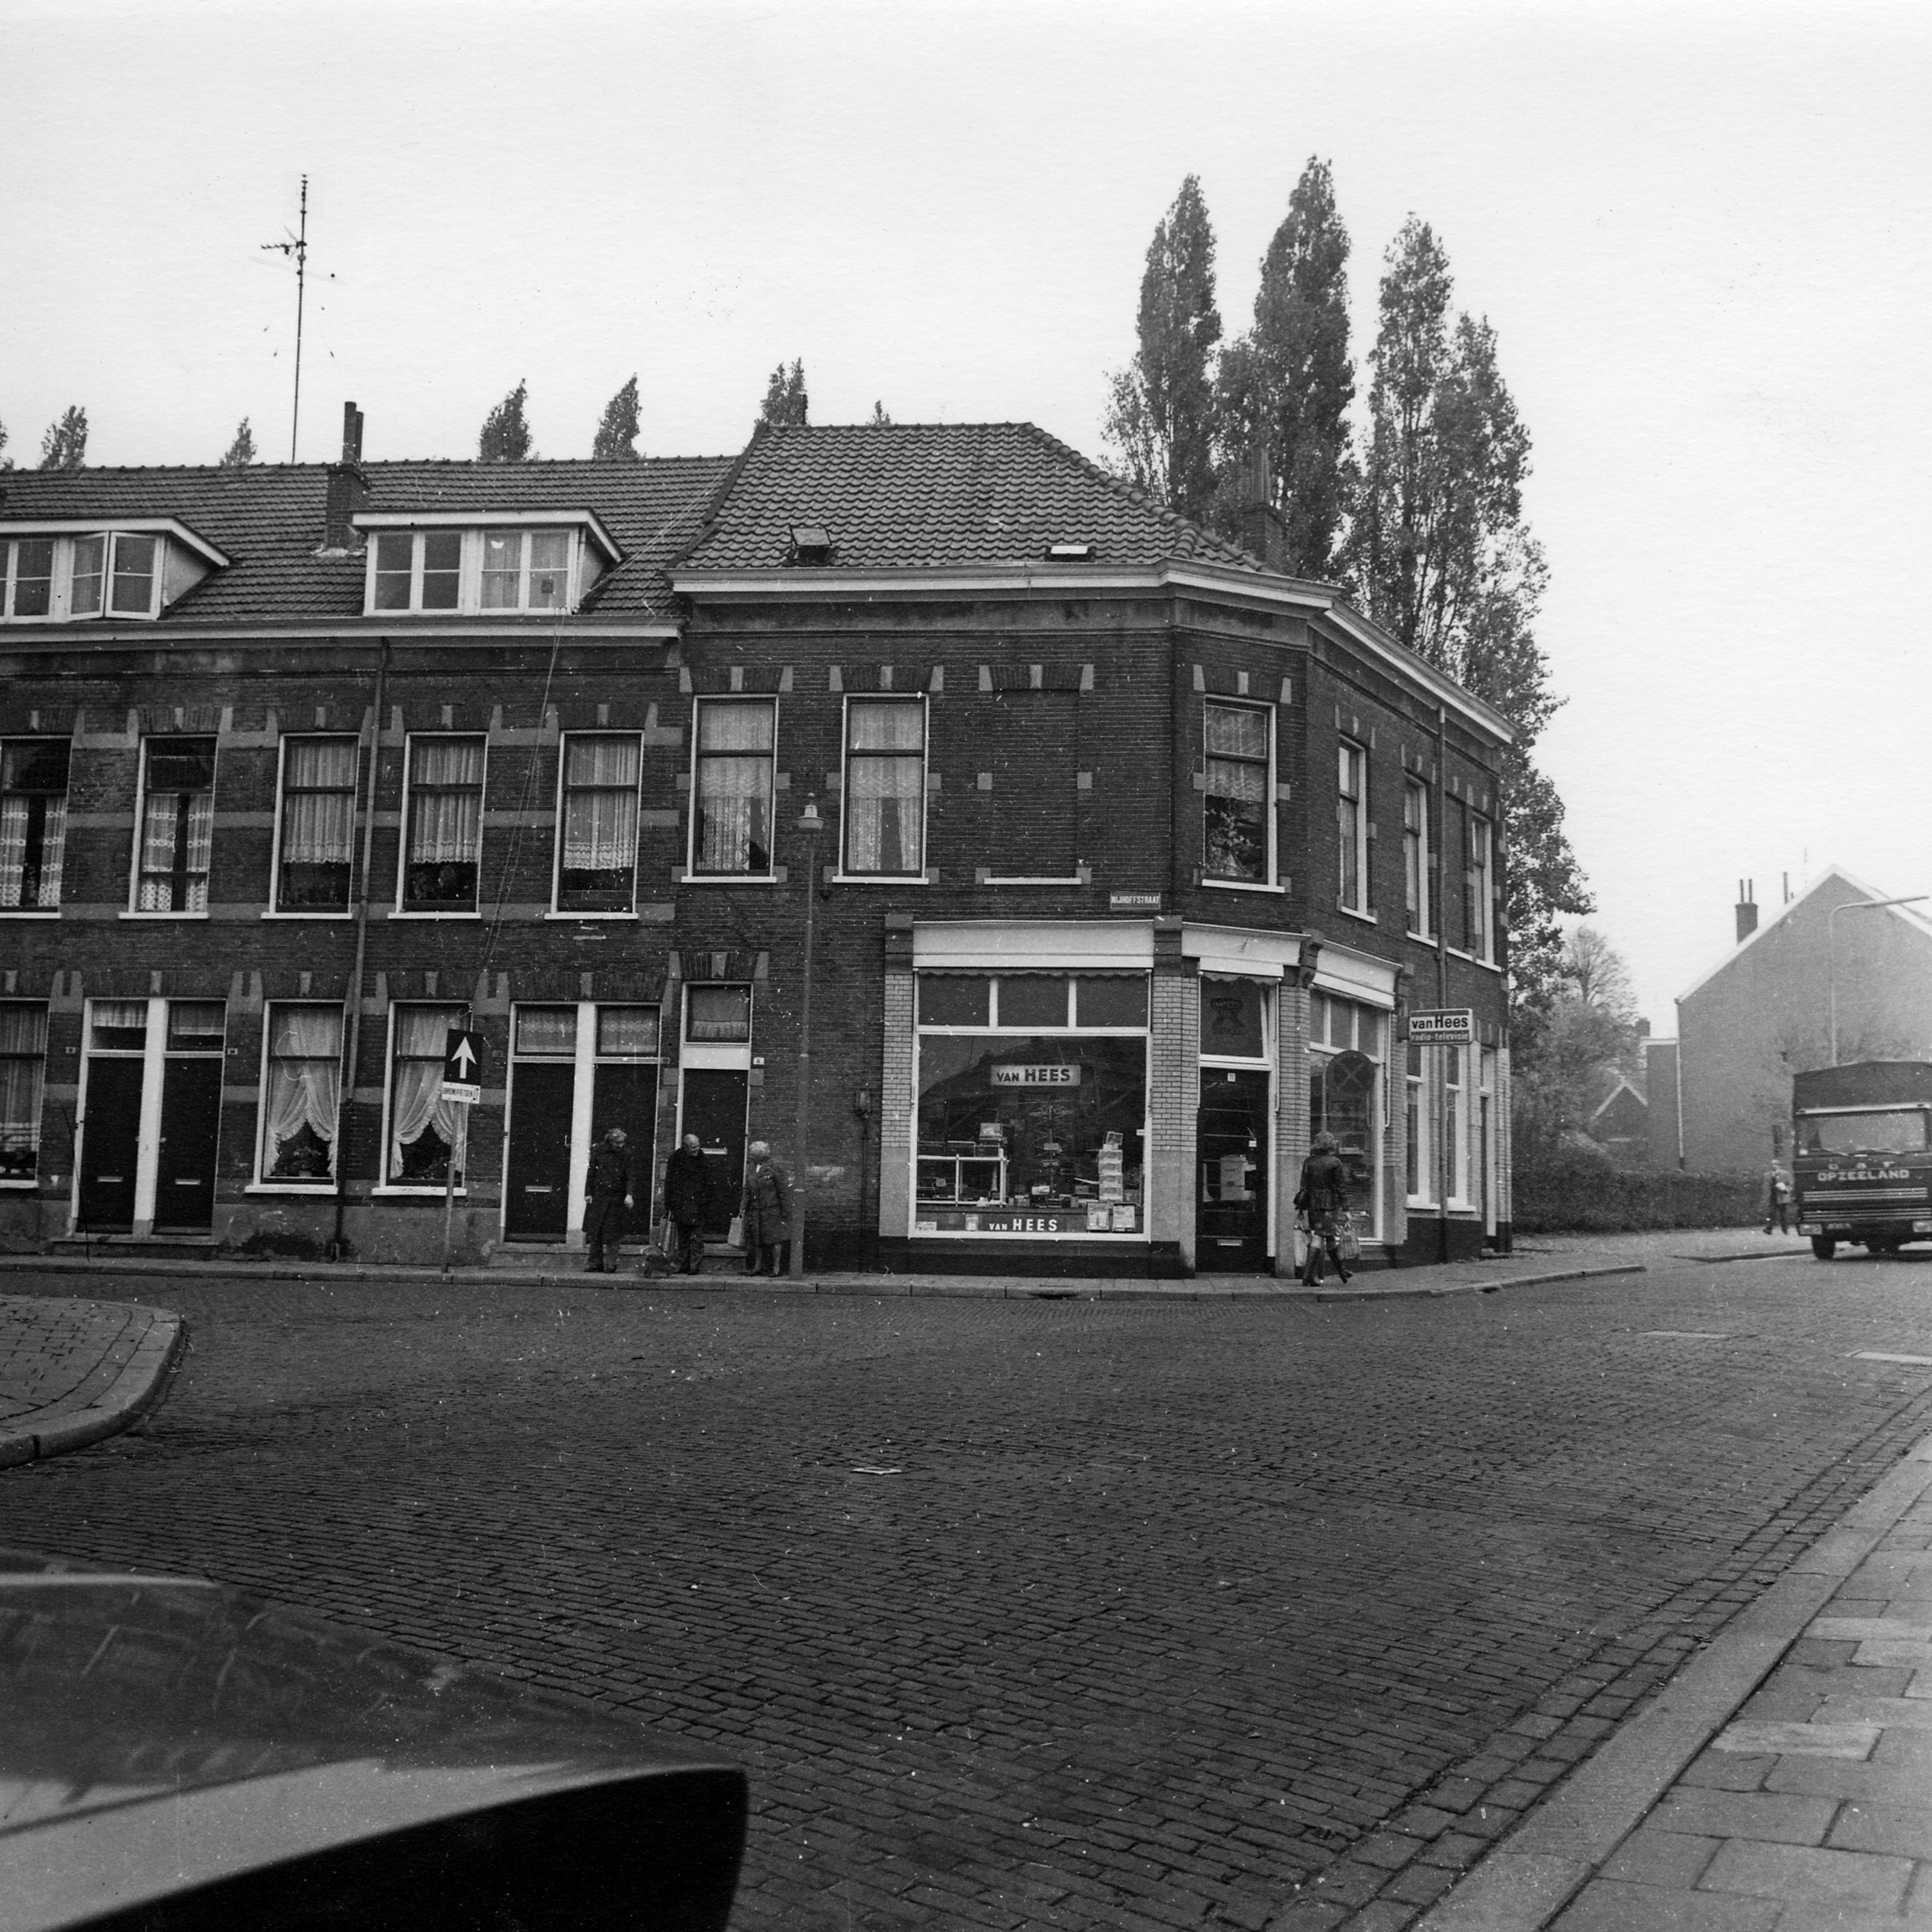 Gemeente Arnhem Jurjen Poeles fotografie project fotografie Vastgoedplein Nijhoffstraat portret sint Marten omgevingsportret Hommelsweg wijkagent